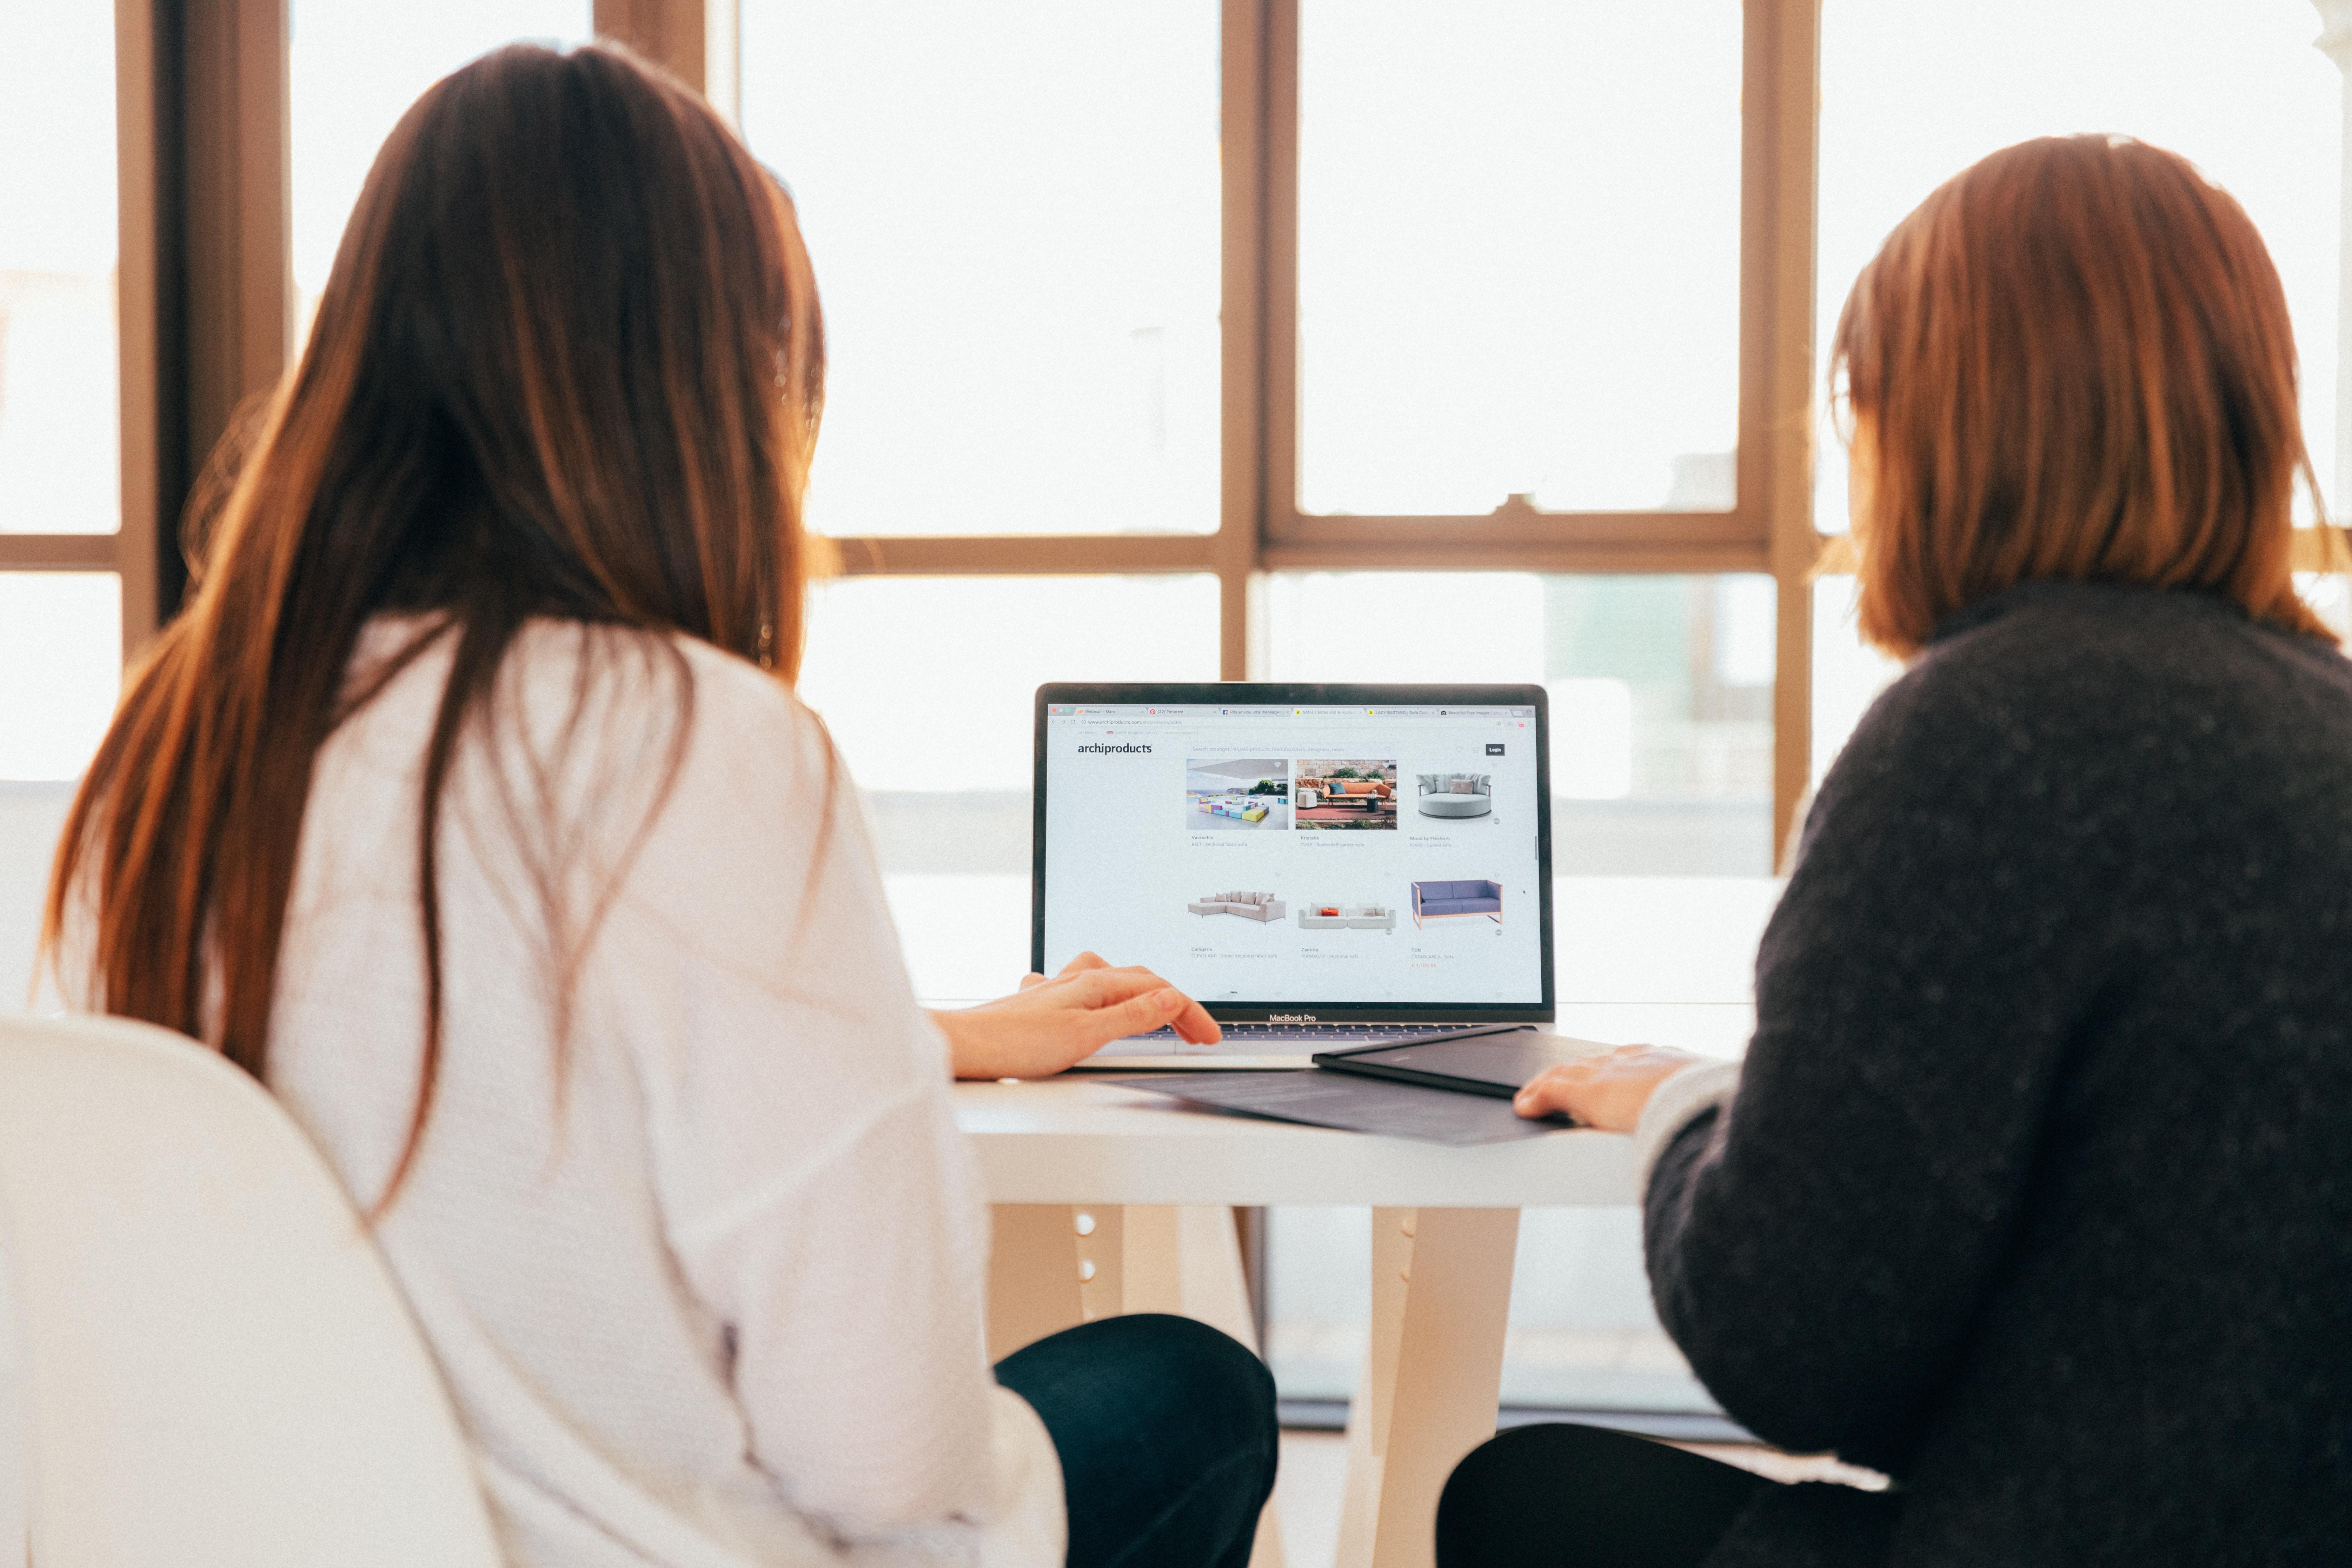 team work in organisations